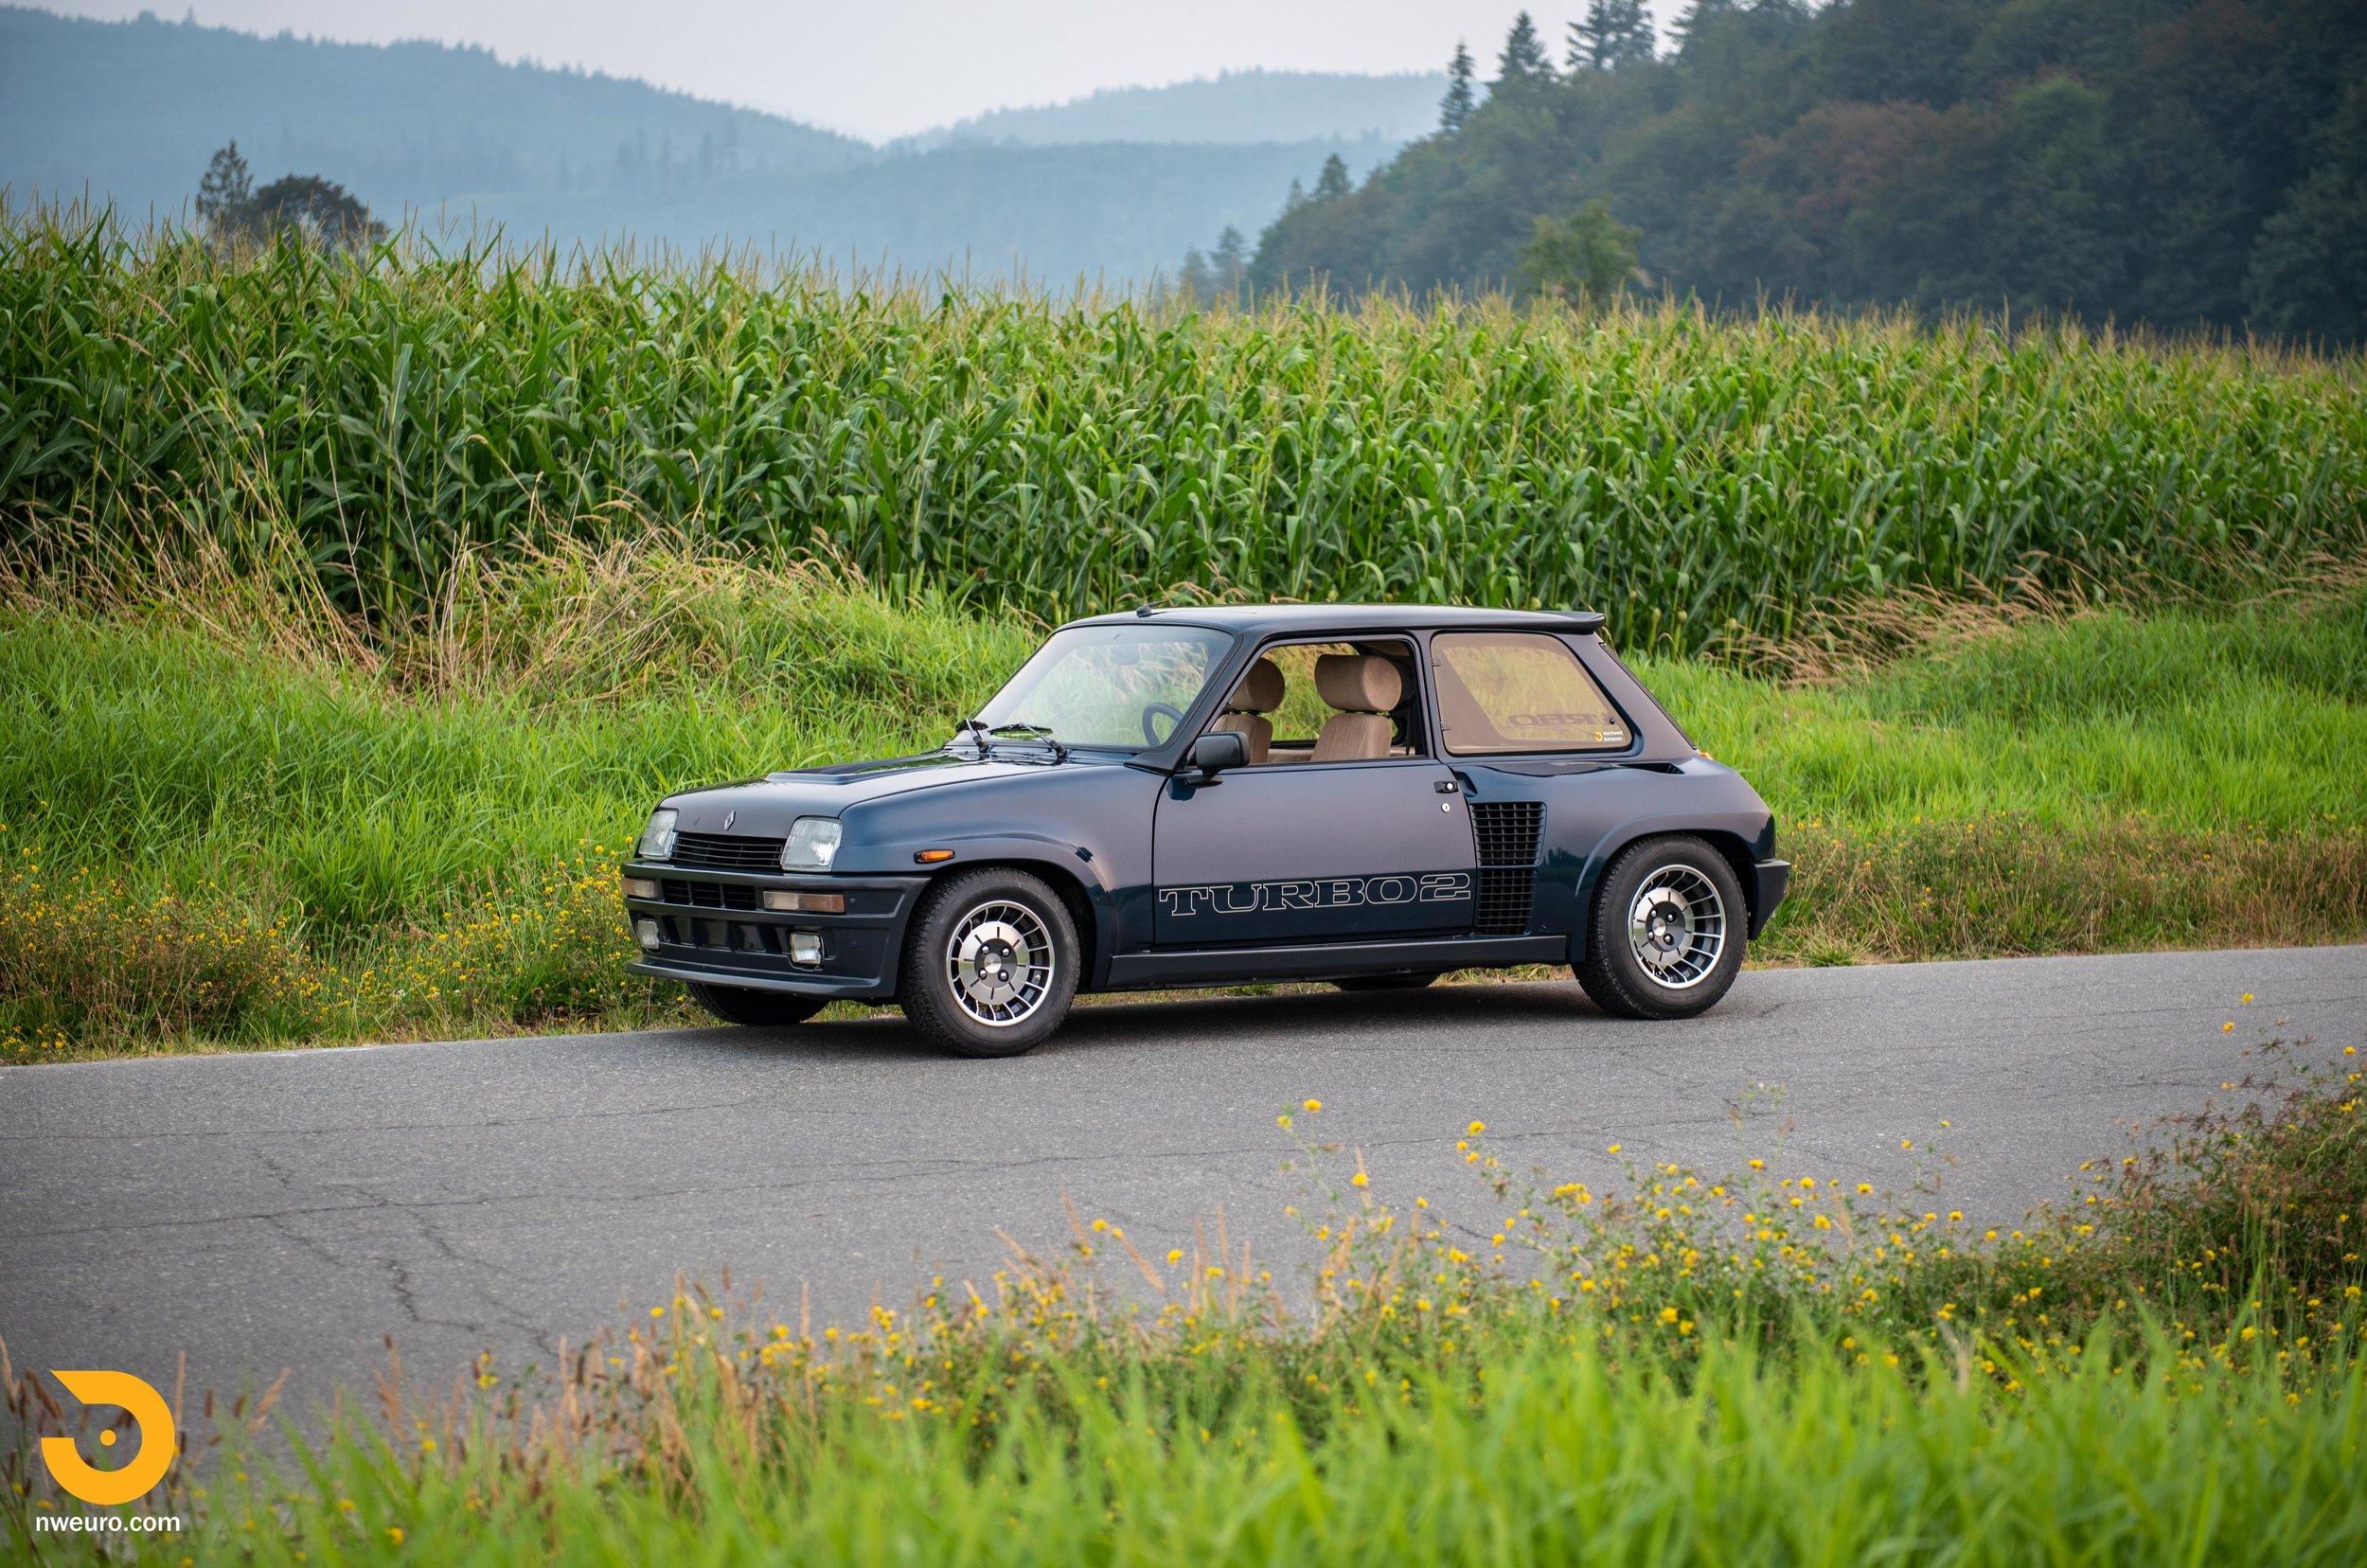 Renault on Corn-2.jpg